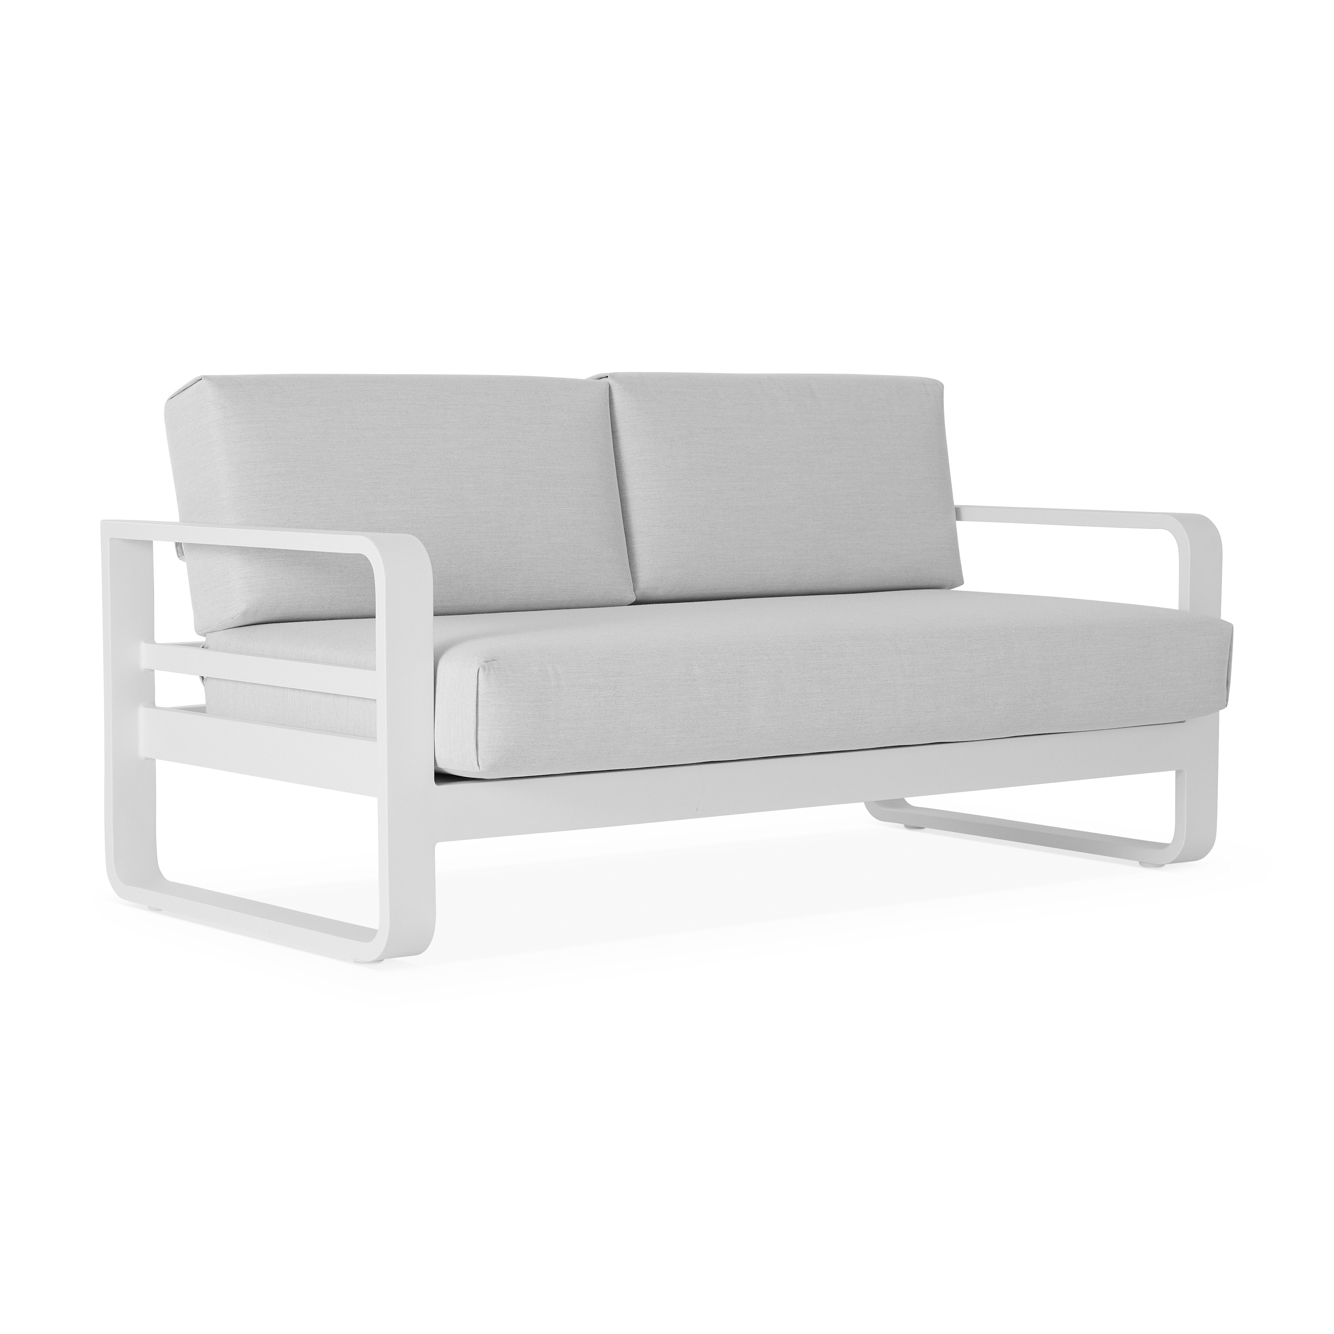 jdv-outfit-canapé-2places-aluminium-blanc.jpg